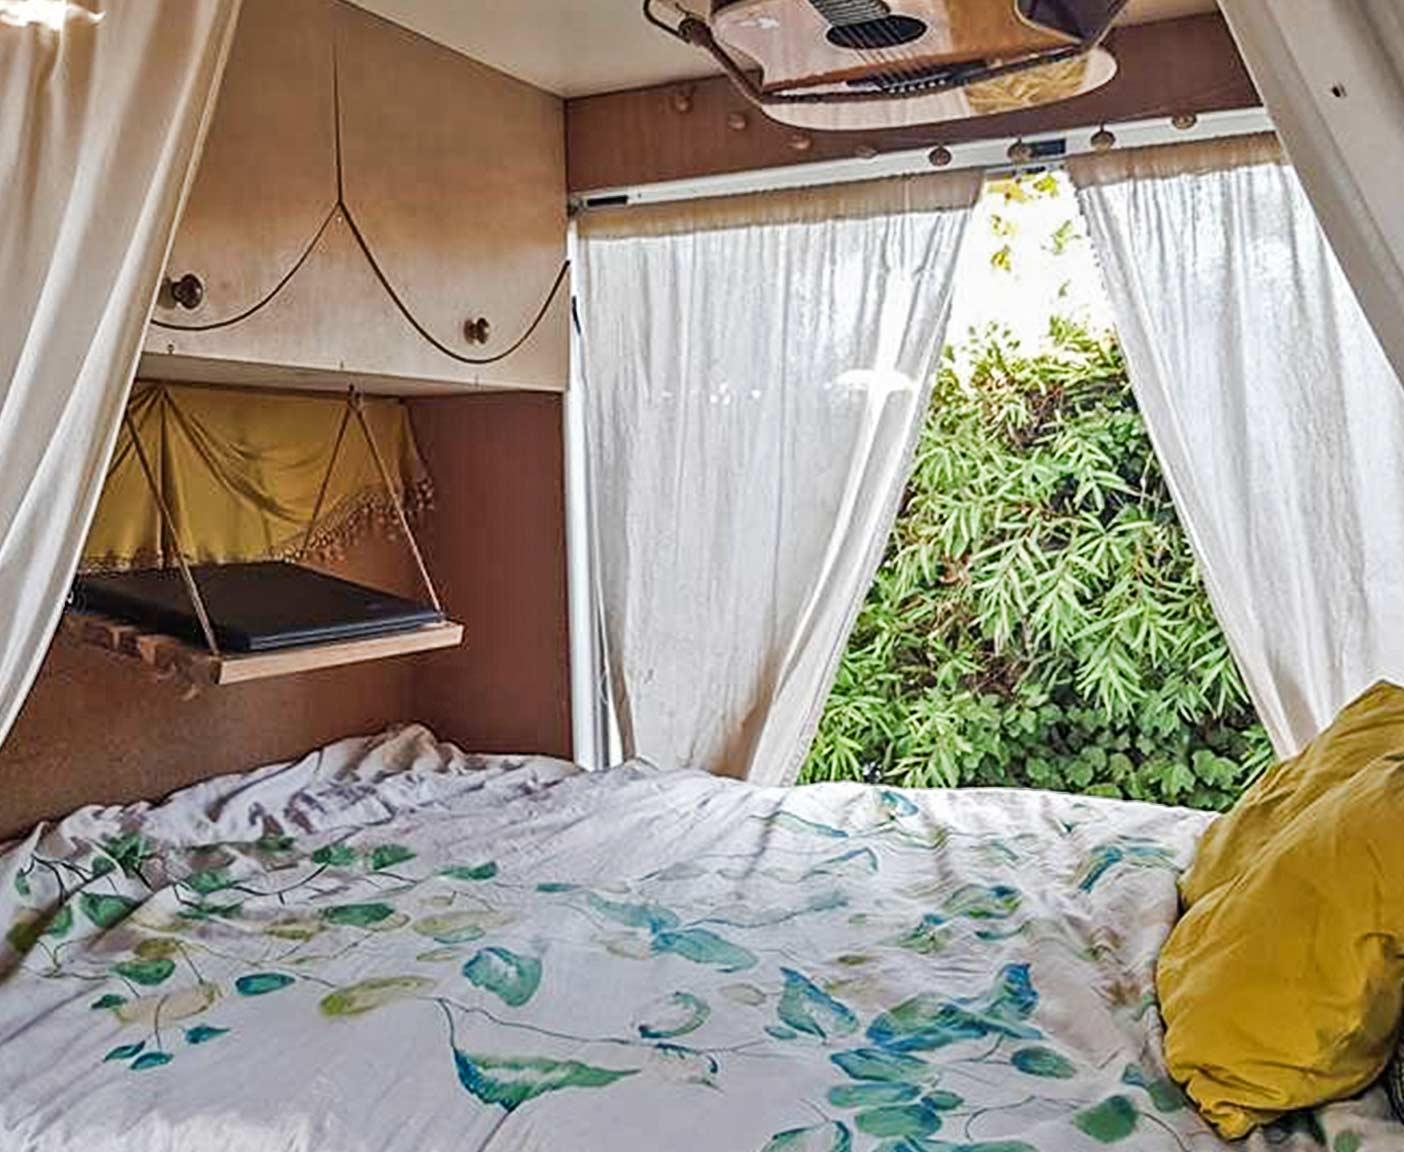 sprinter-mercedes-selbstausbau-wohnmobil-van-camper-campingbus-5